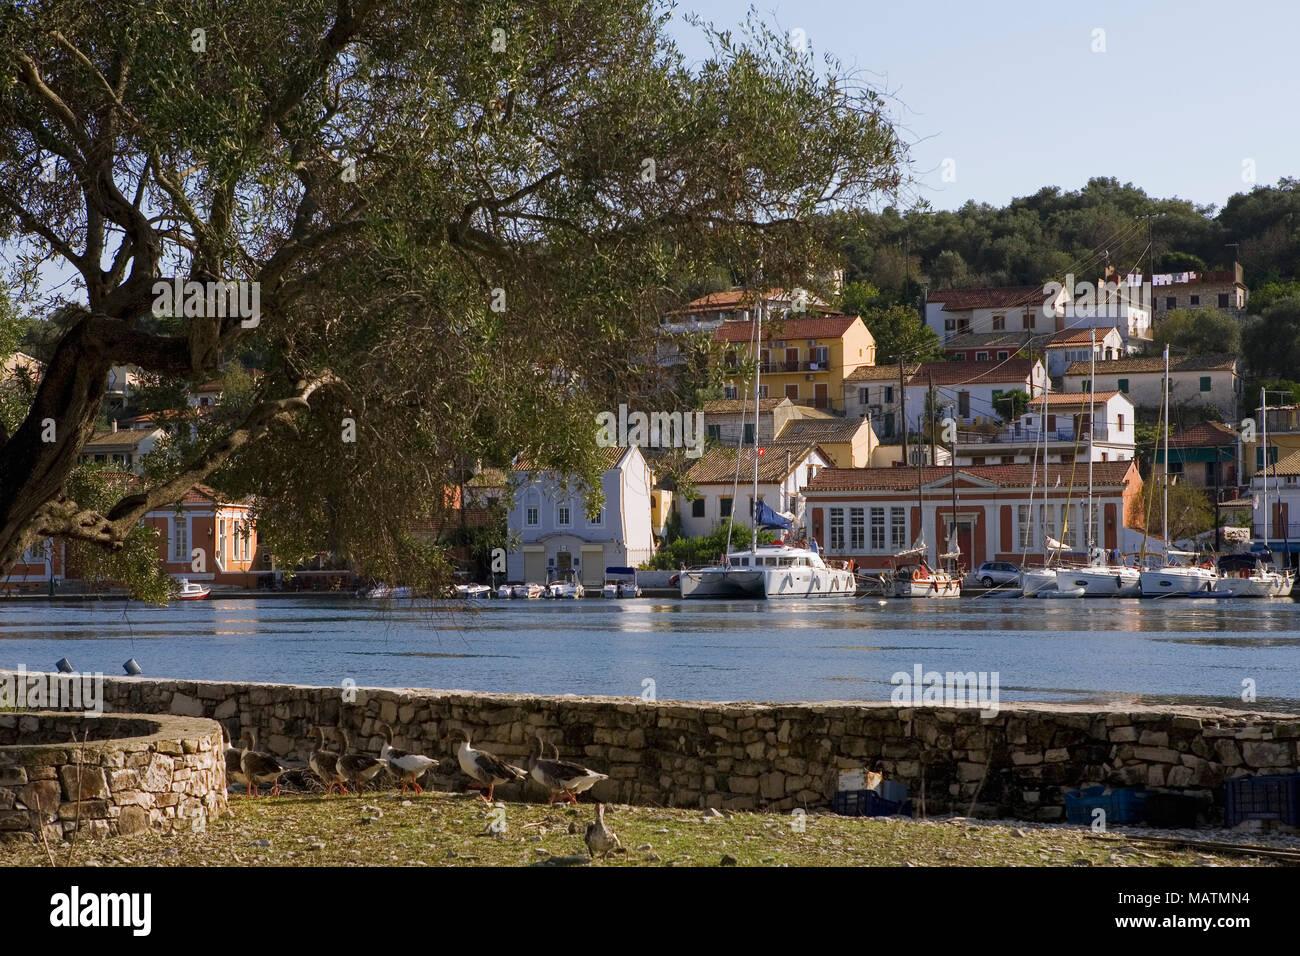 Gaios harbour, from the islet of Agios Nikolaos, Paxos, Greece - Stock Image